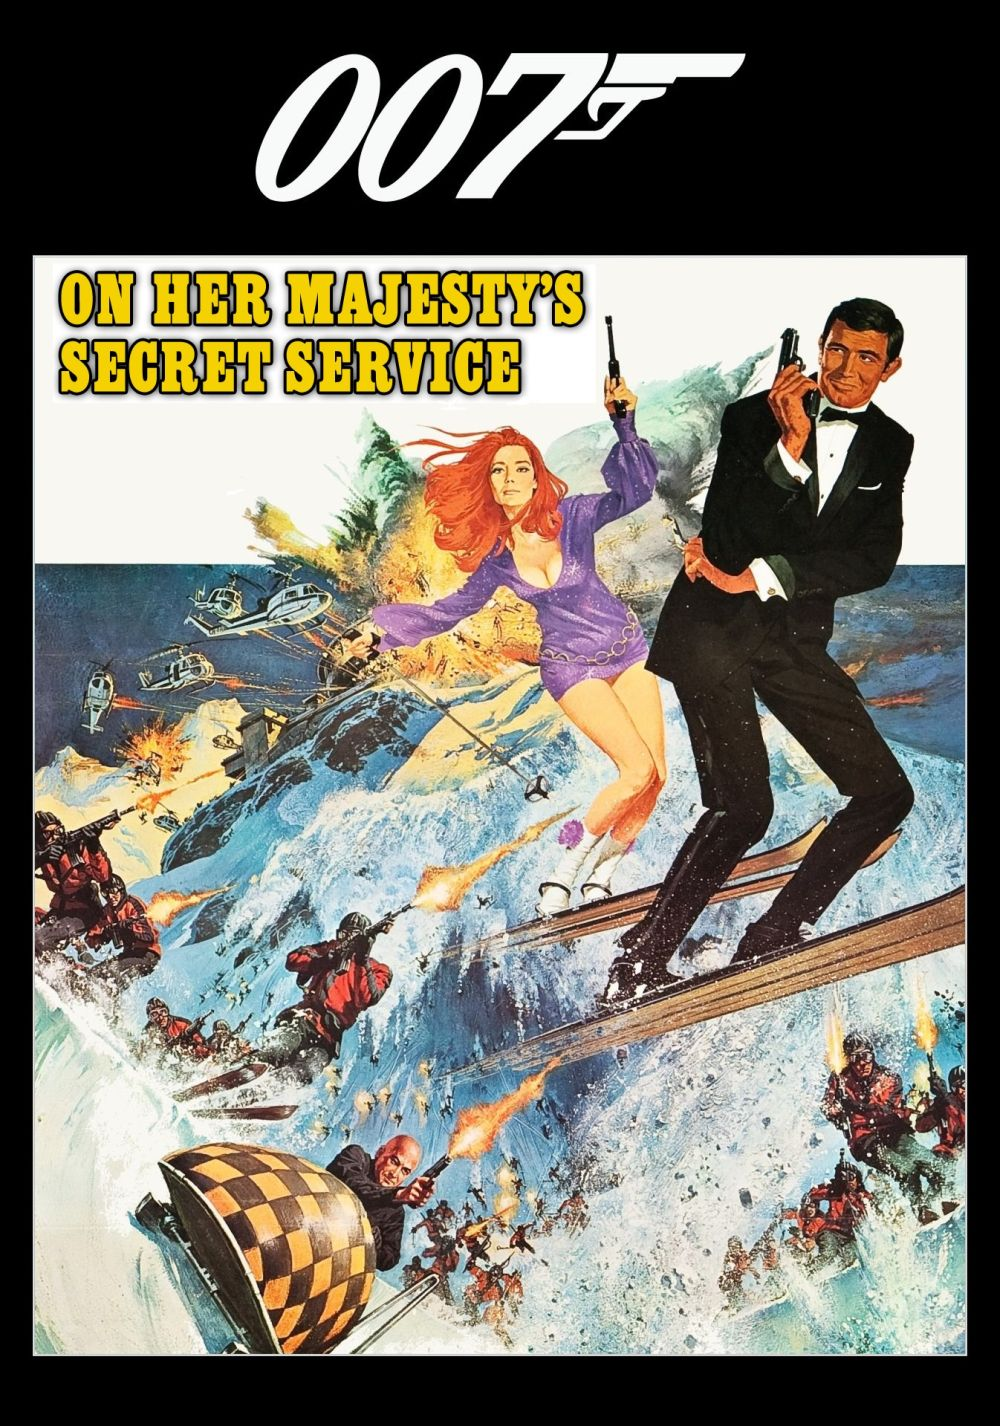 On Her Majesty's Secret Service | Movie fanart | fanart.tv